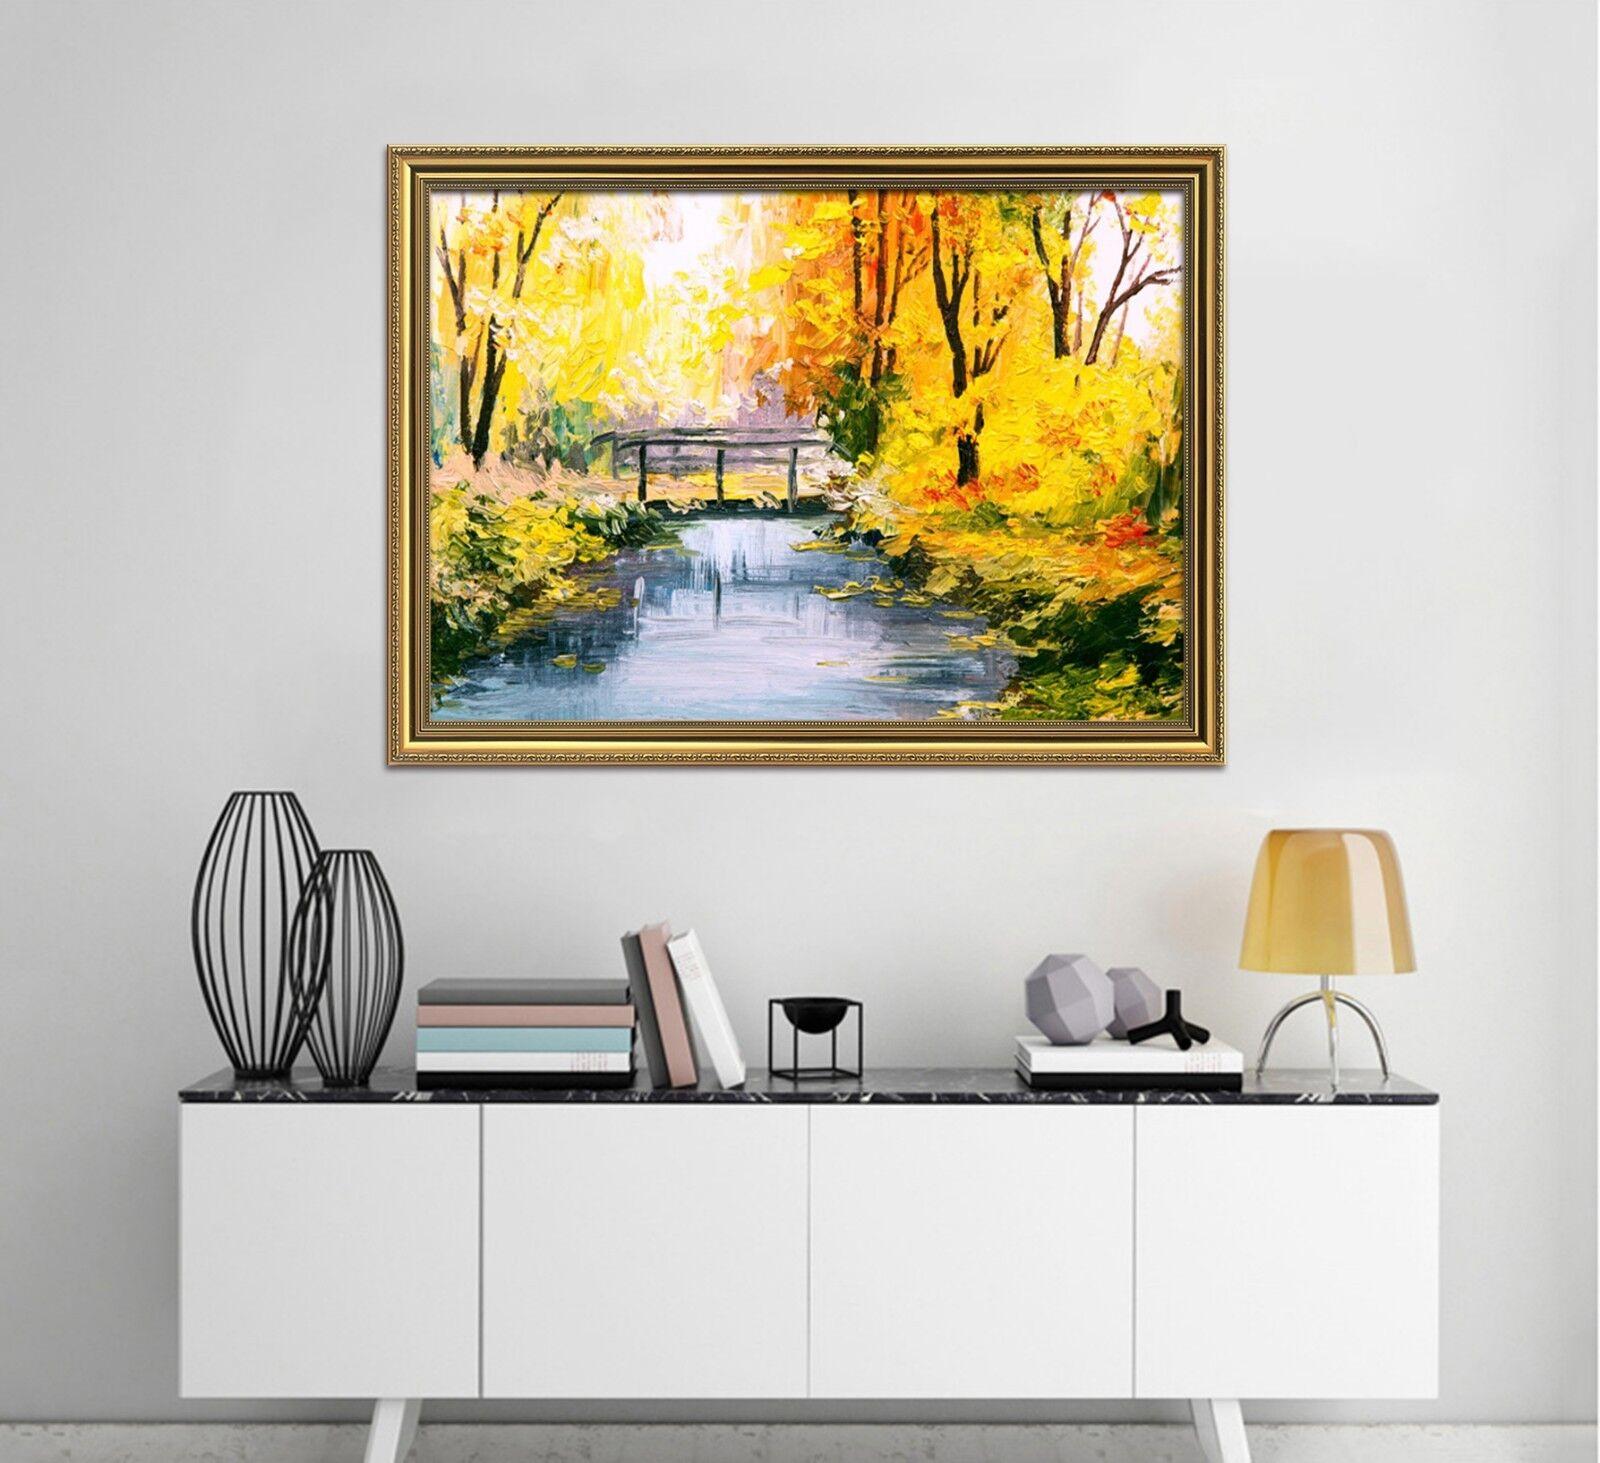 3D Gold Baum Brücke 48 Gerahmt Poster Daheim Dekor Drucken Malerei Kunst AJ